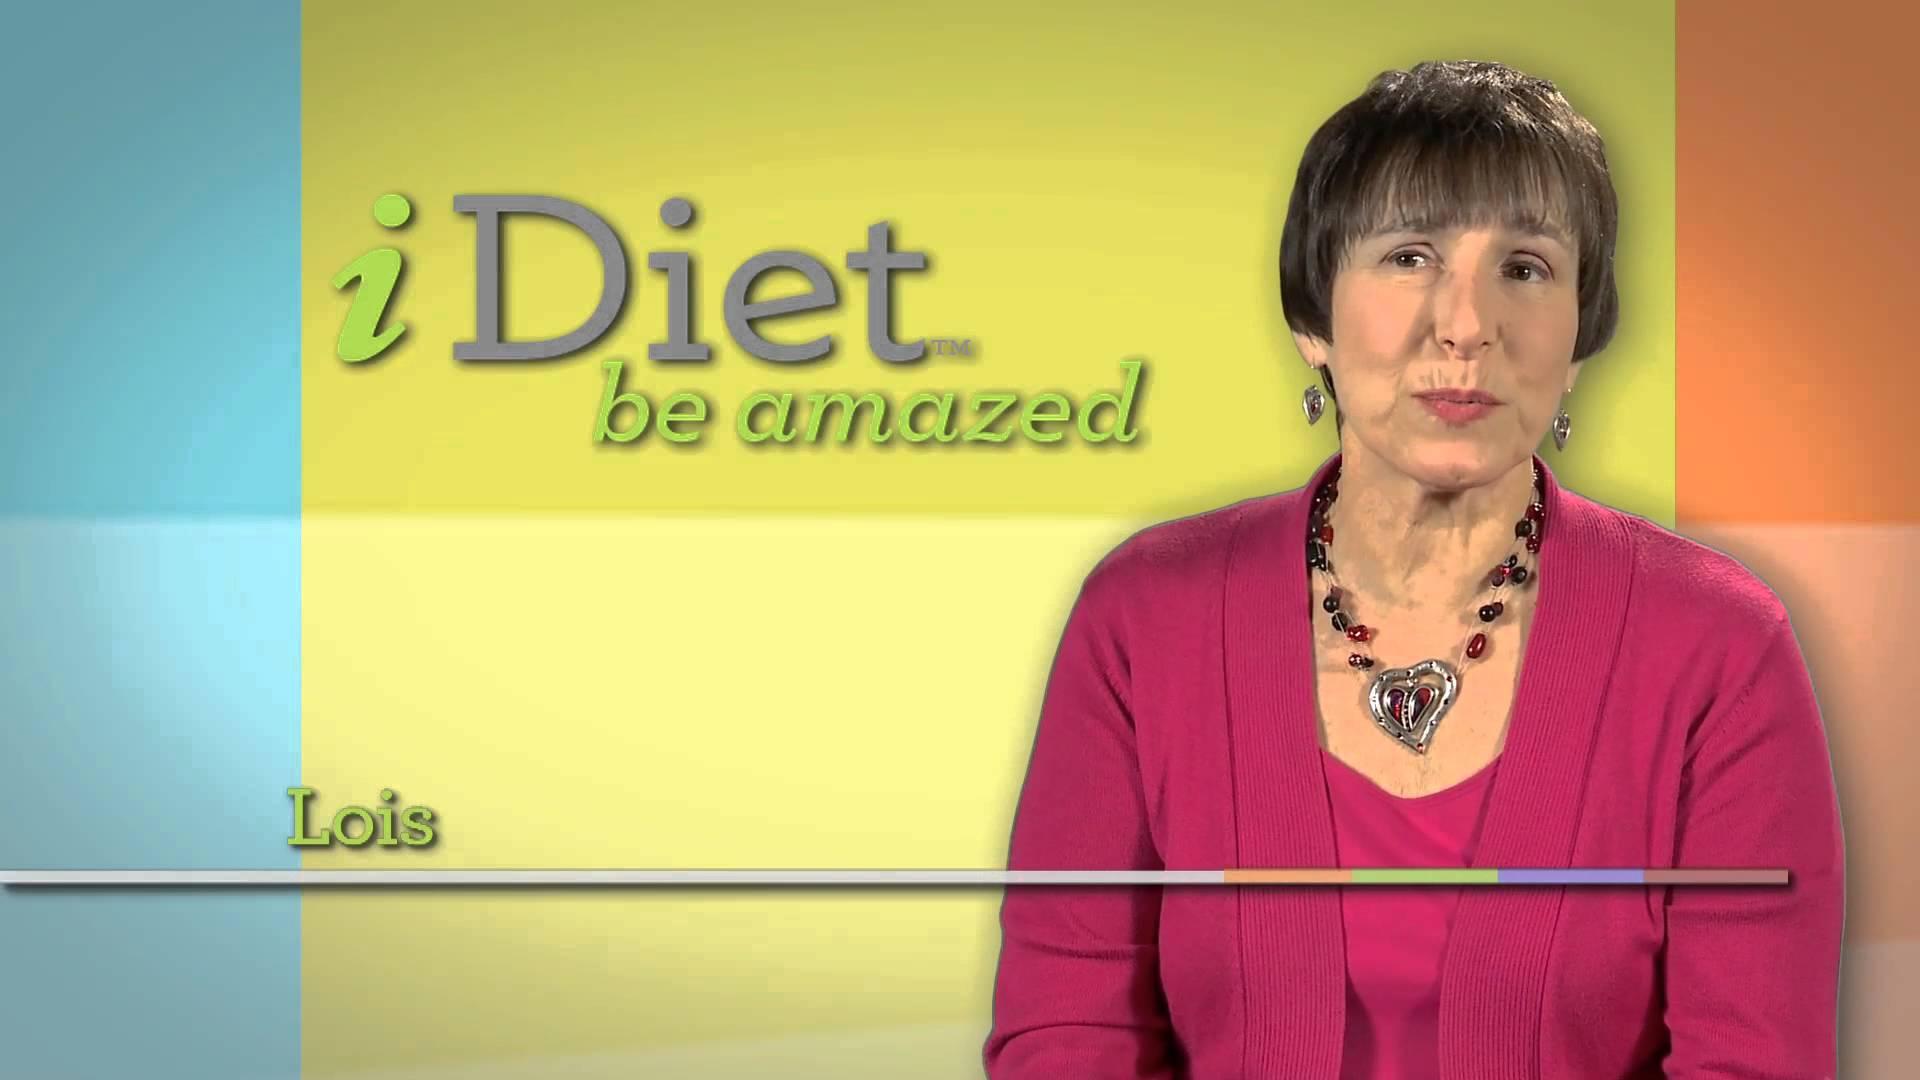 СТБ iDiet - калории под контролем, скачать STD iDiet на Android